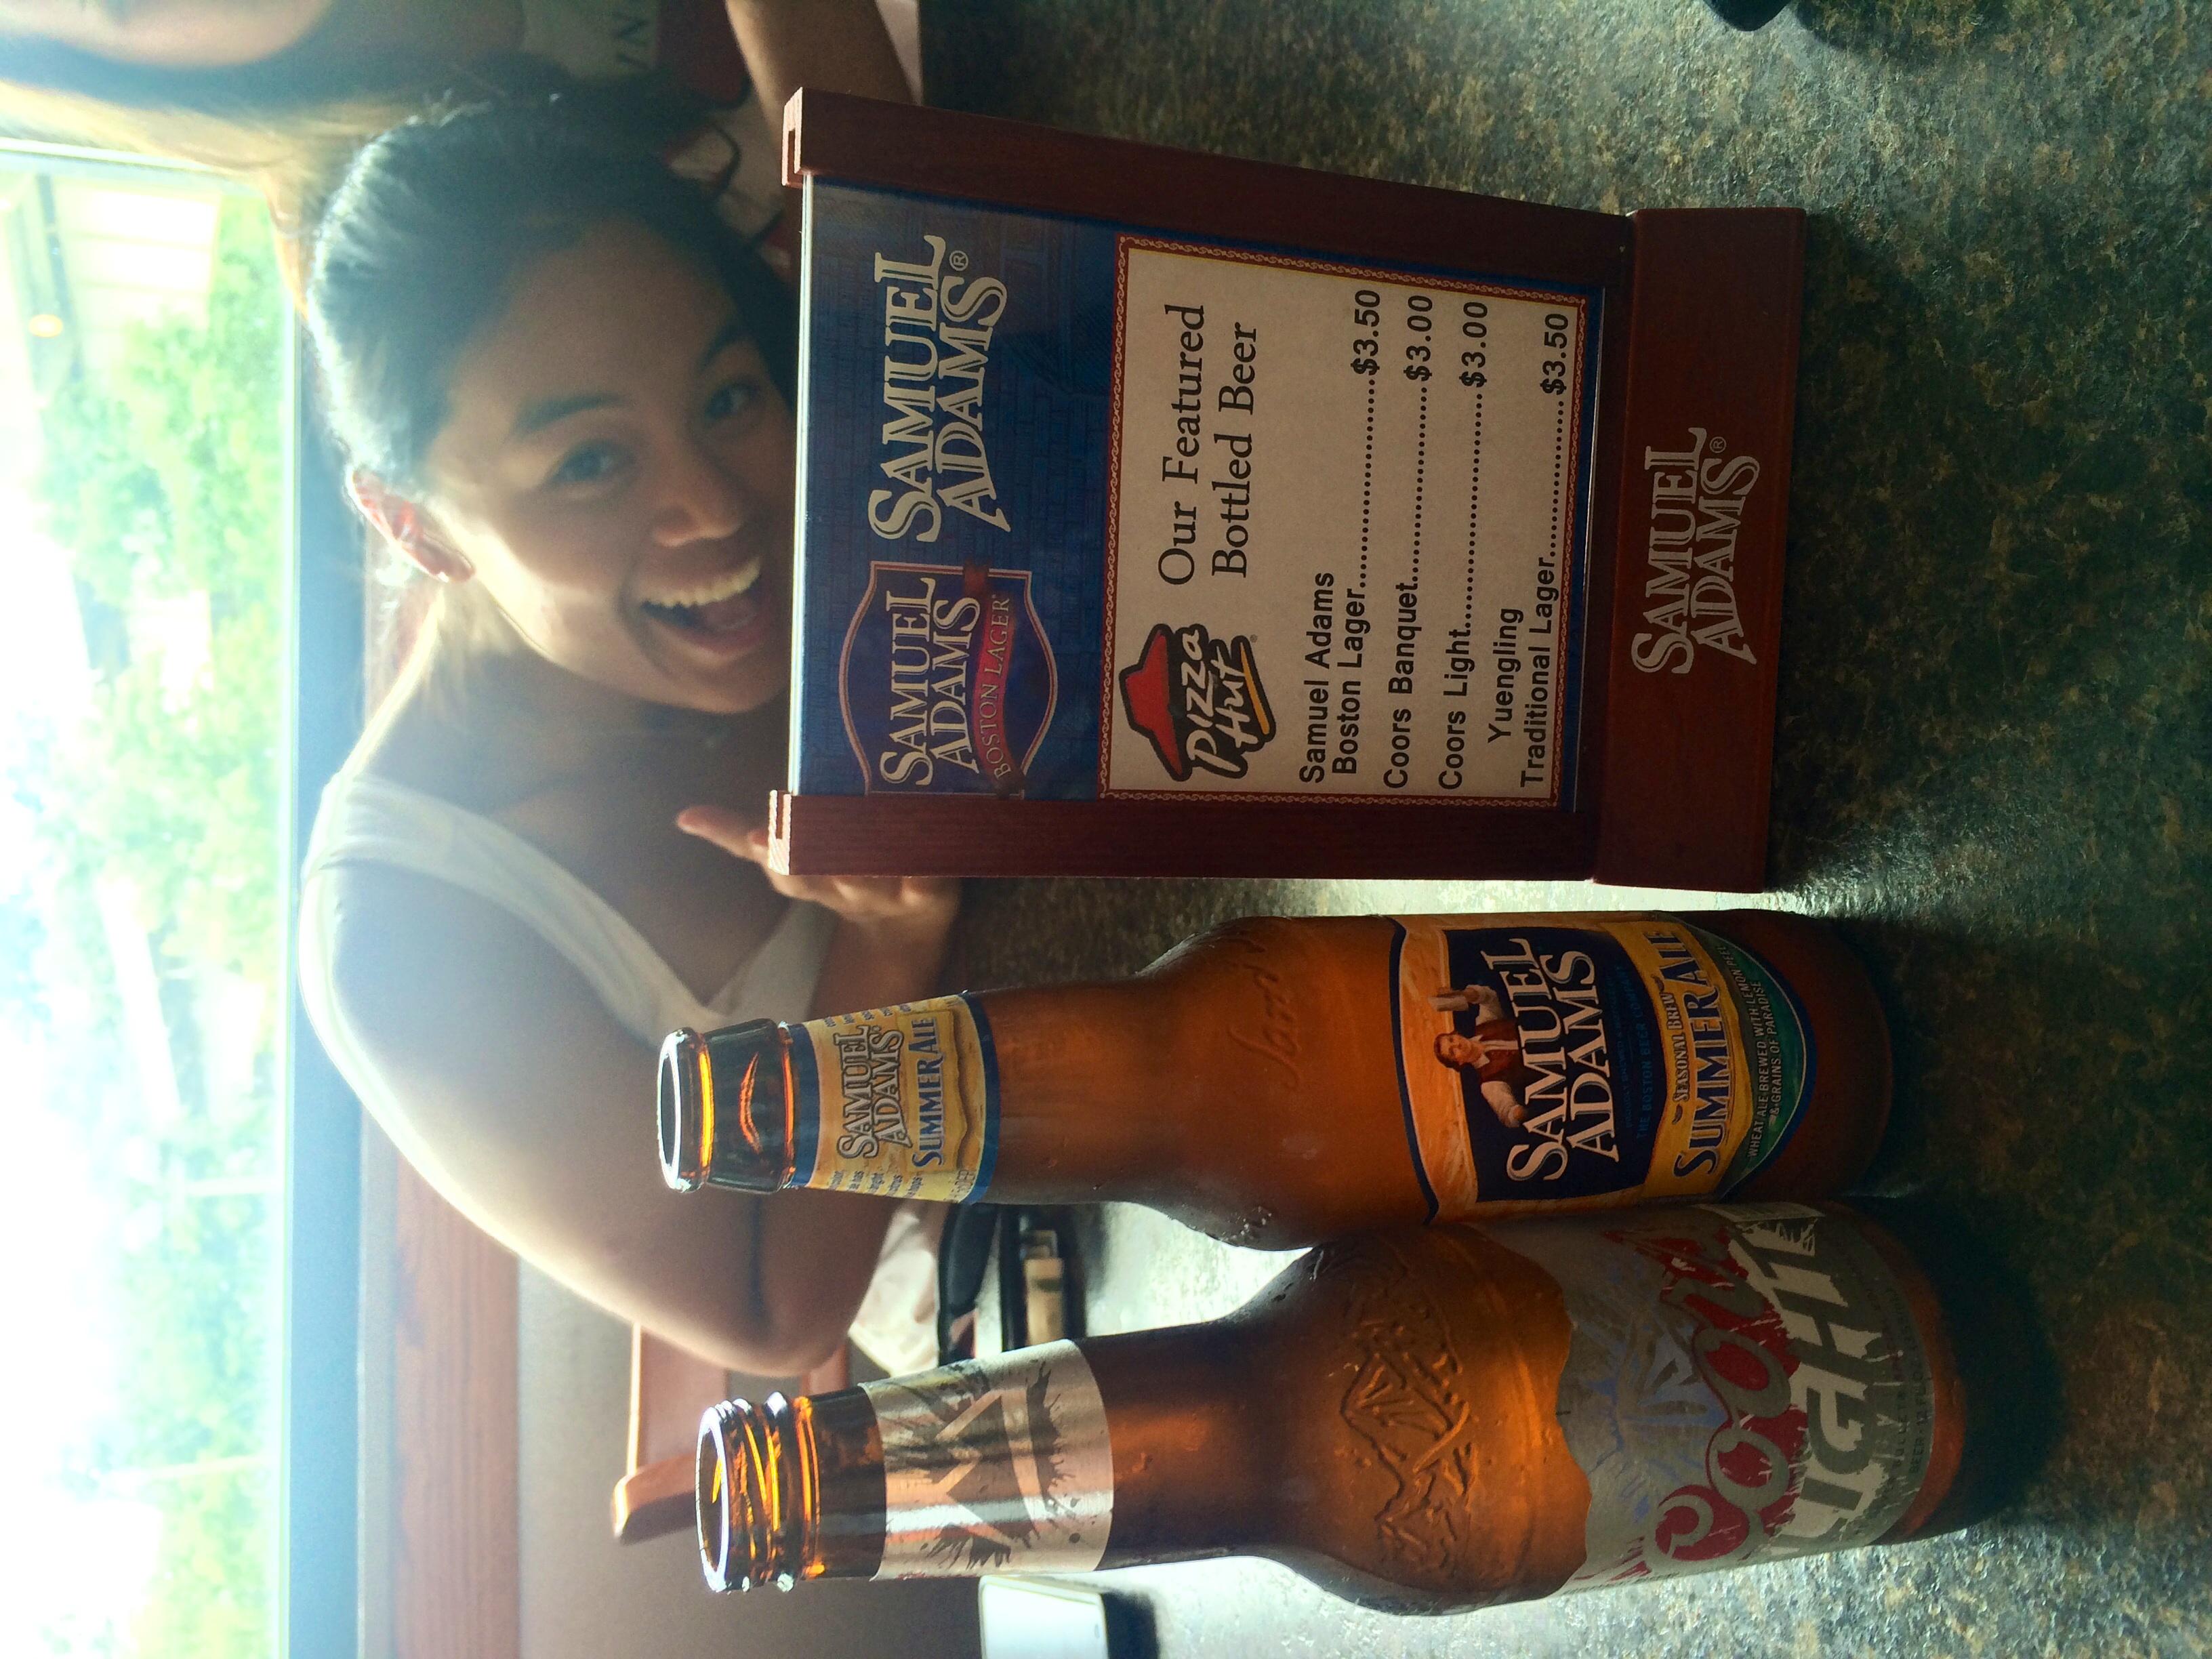 Beer selection at Pizza Hut!